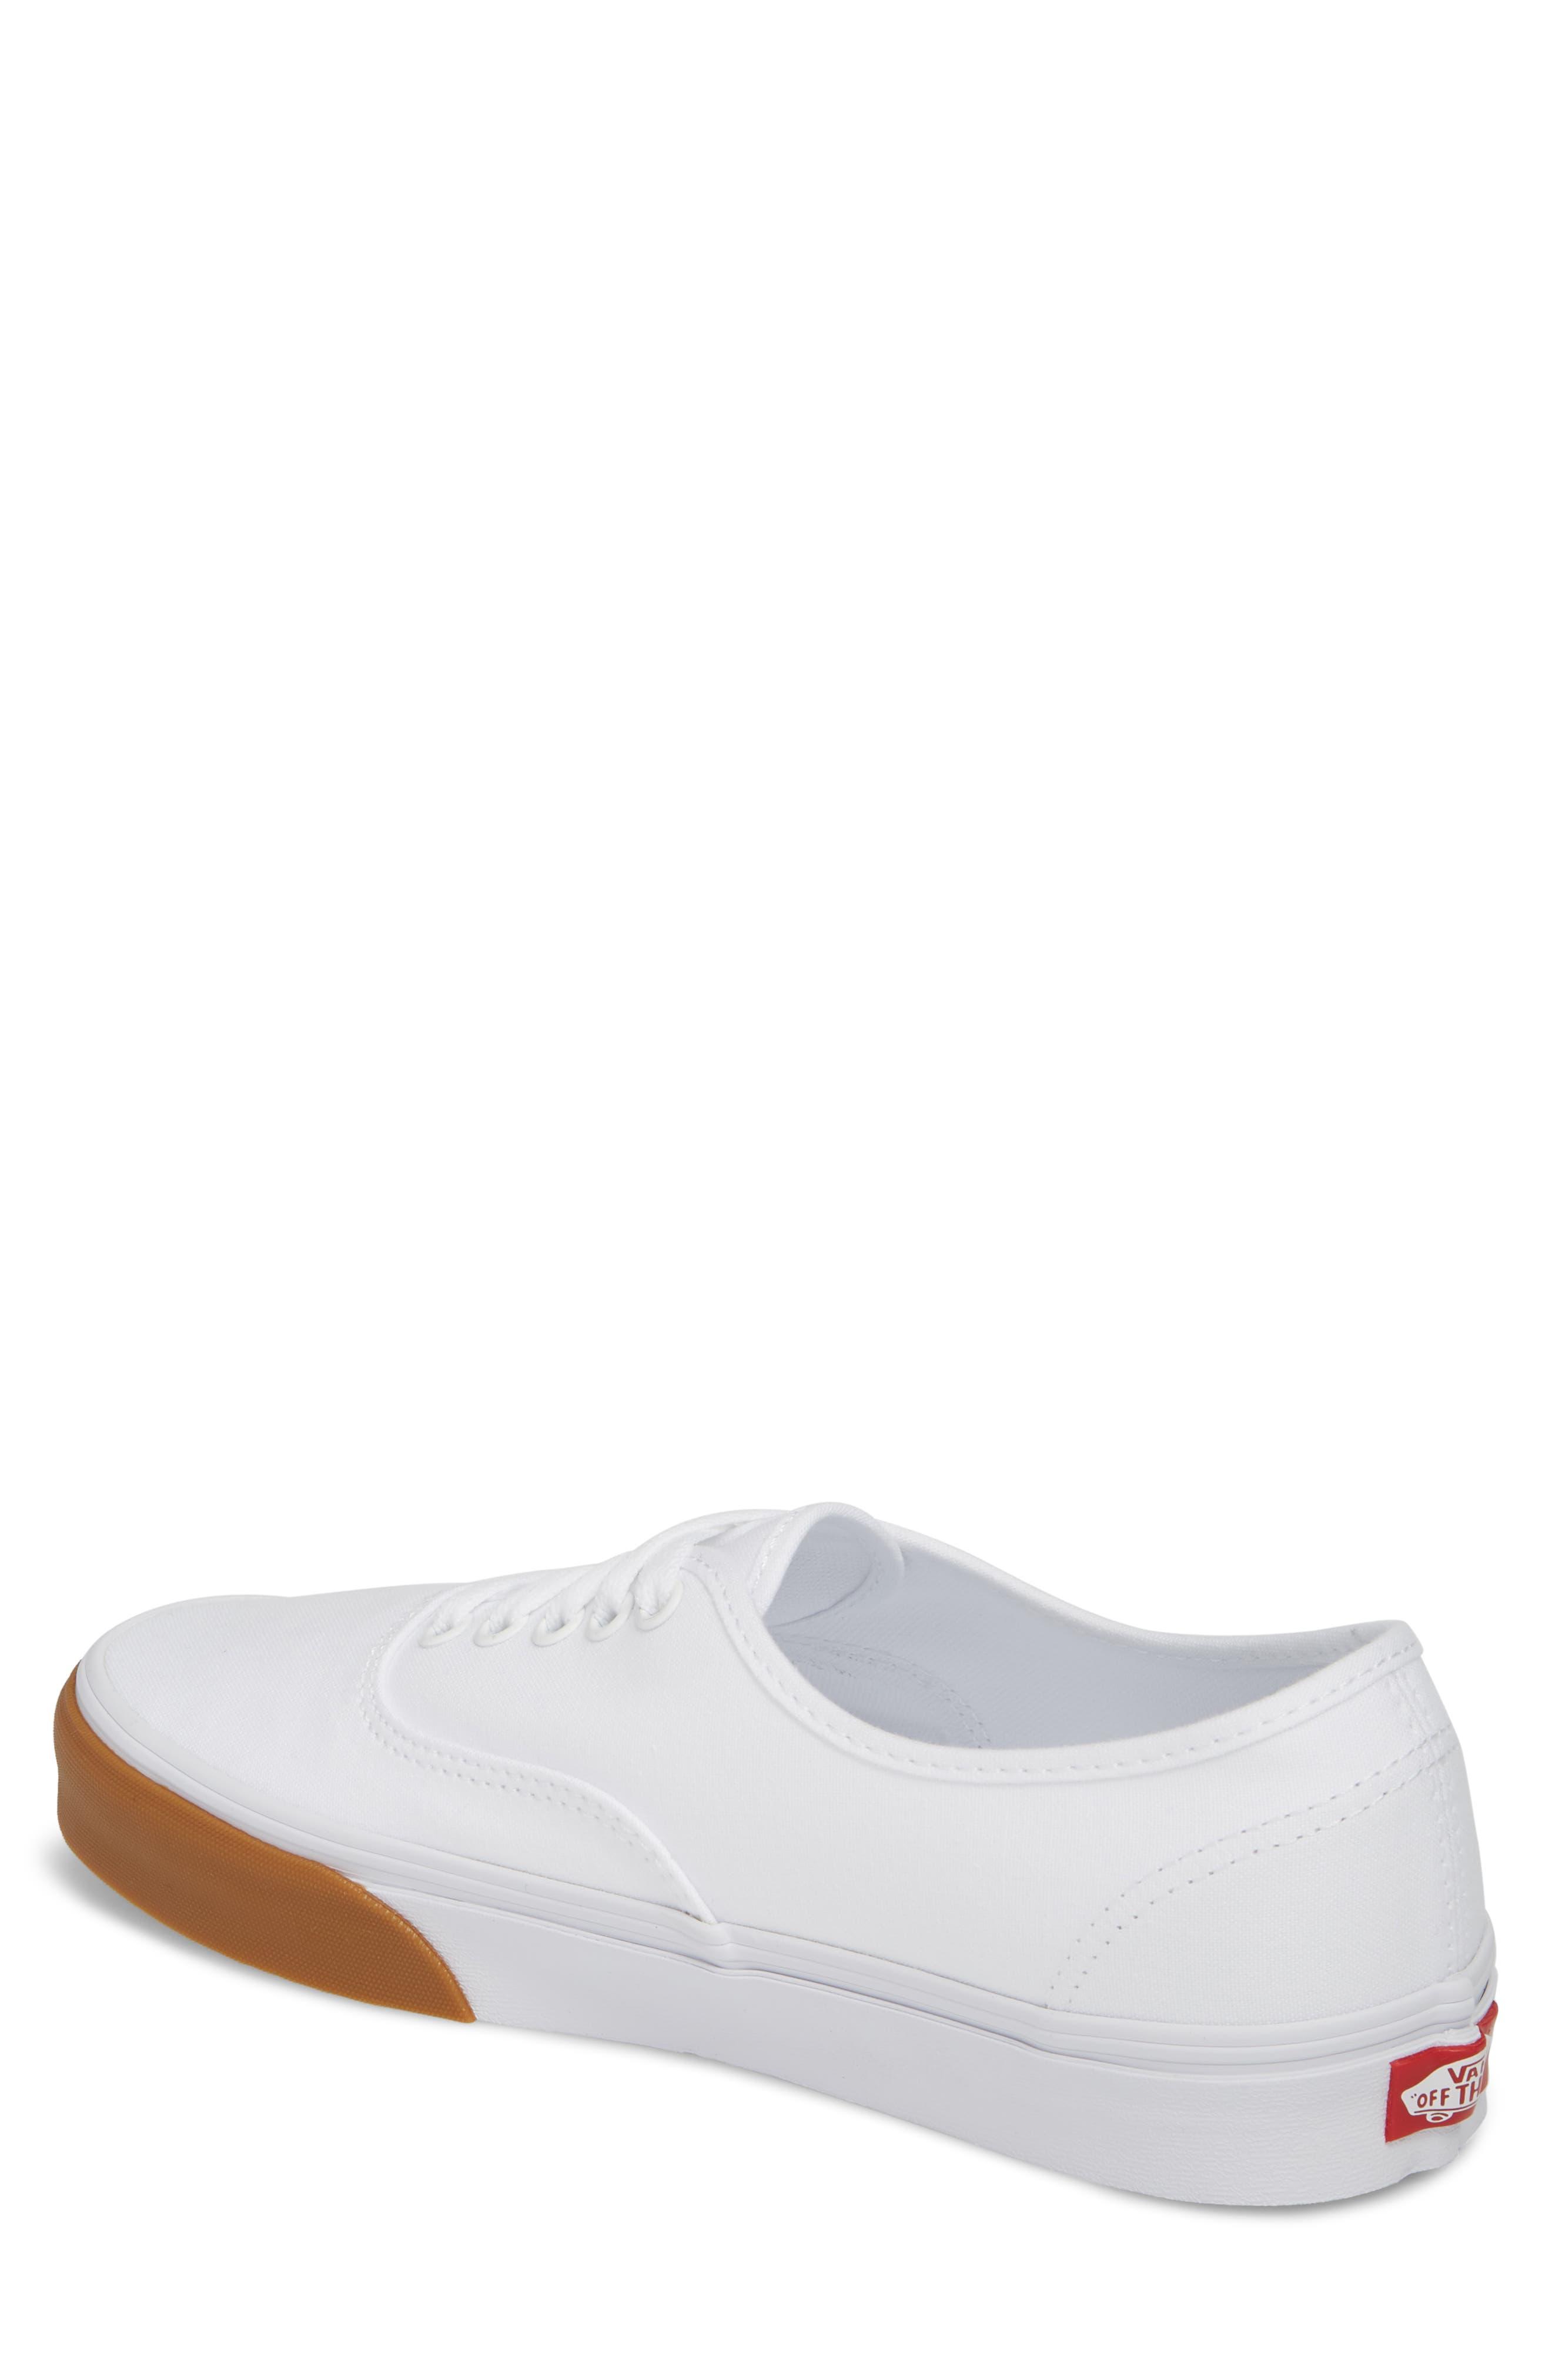 Authentic Gum Bumper Sneaker,                             Alternate thumbnail 2, color,                             True White/ True White